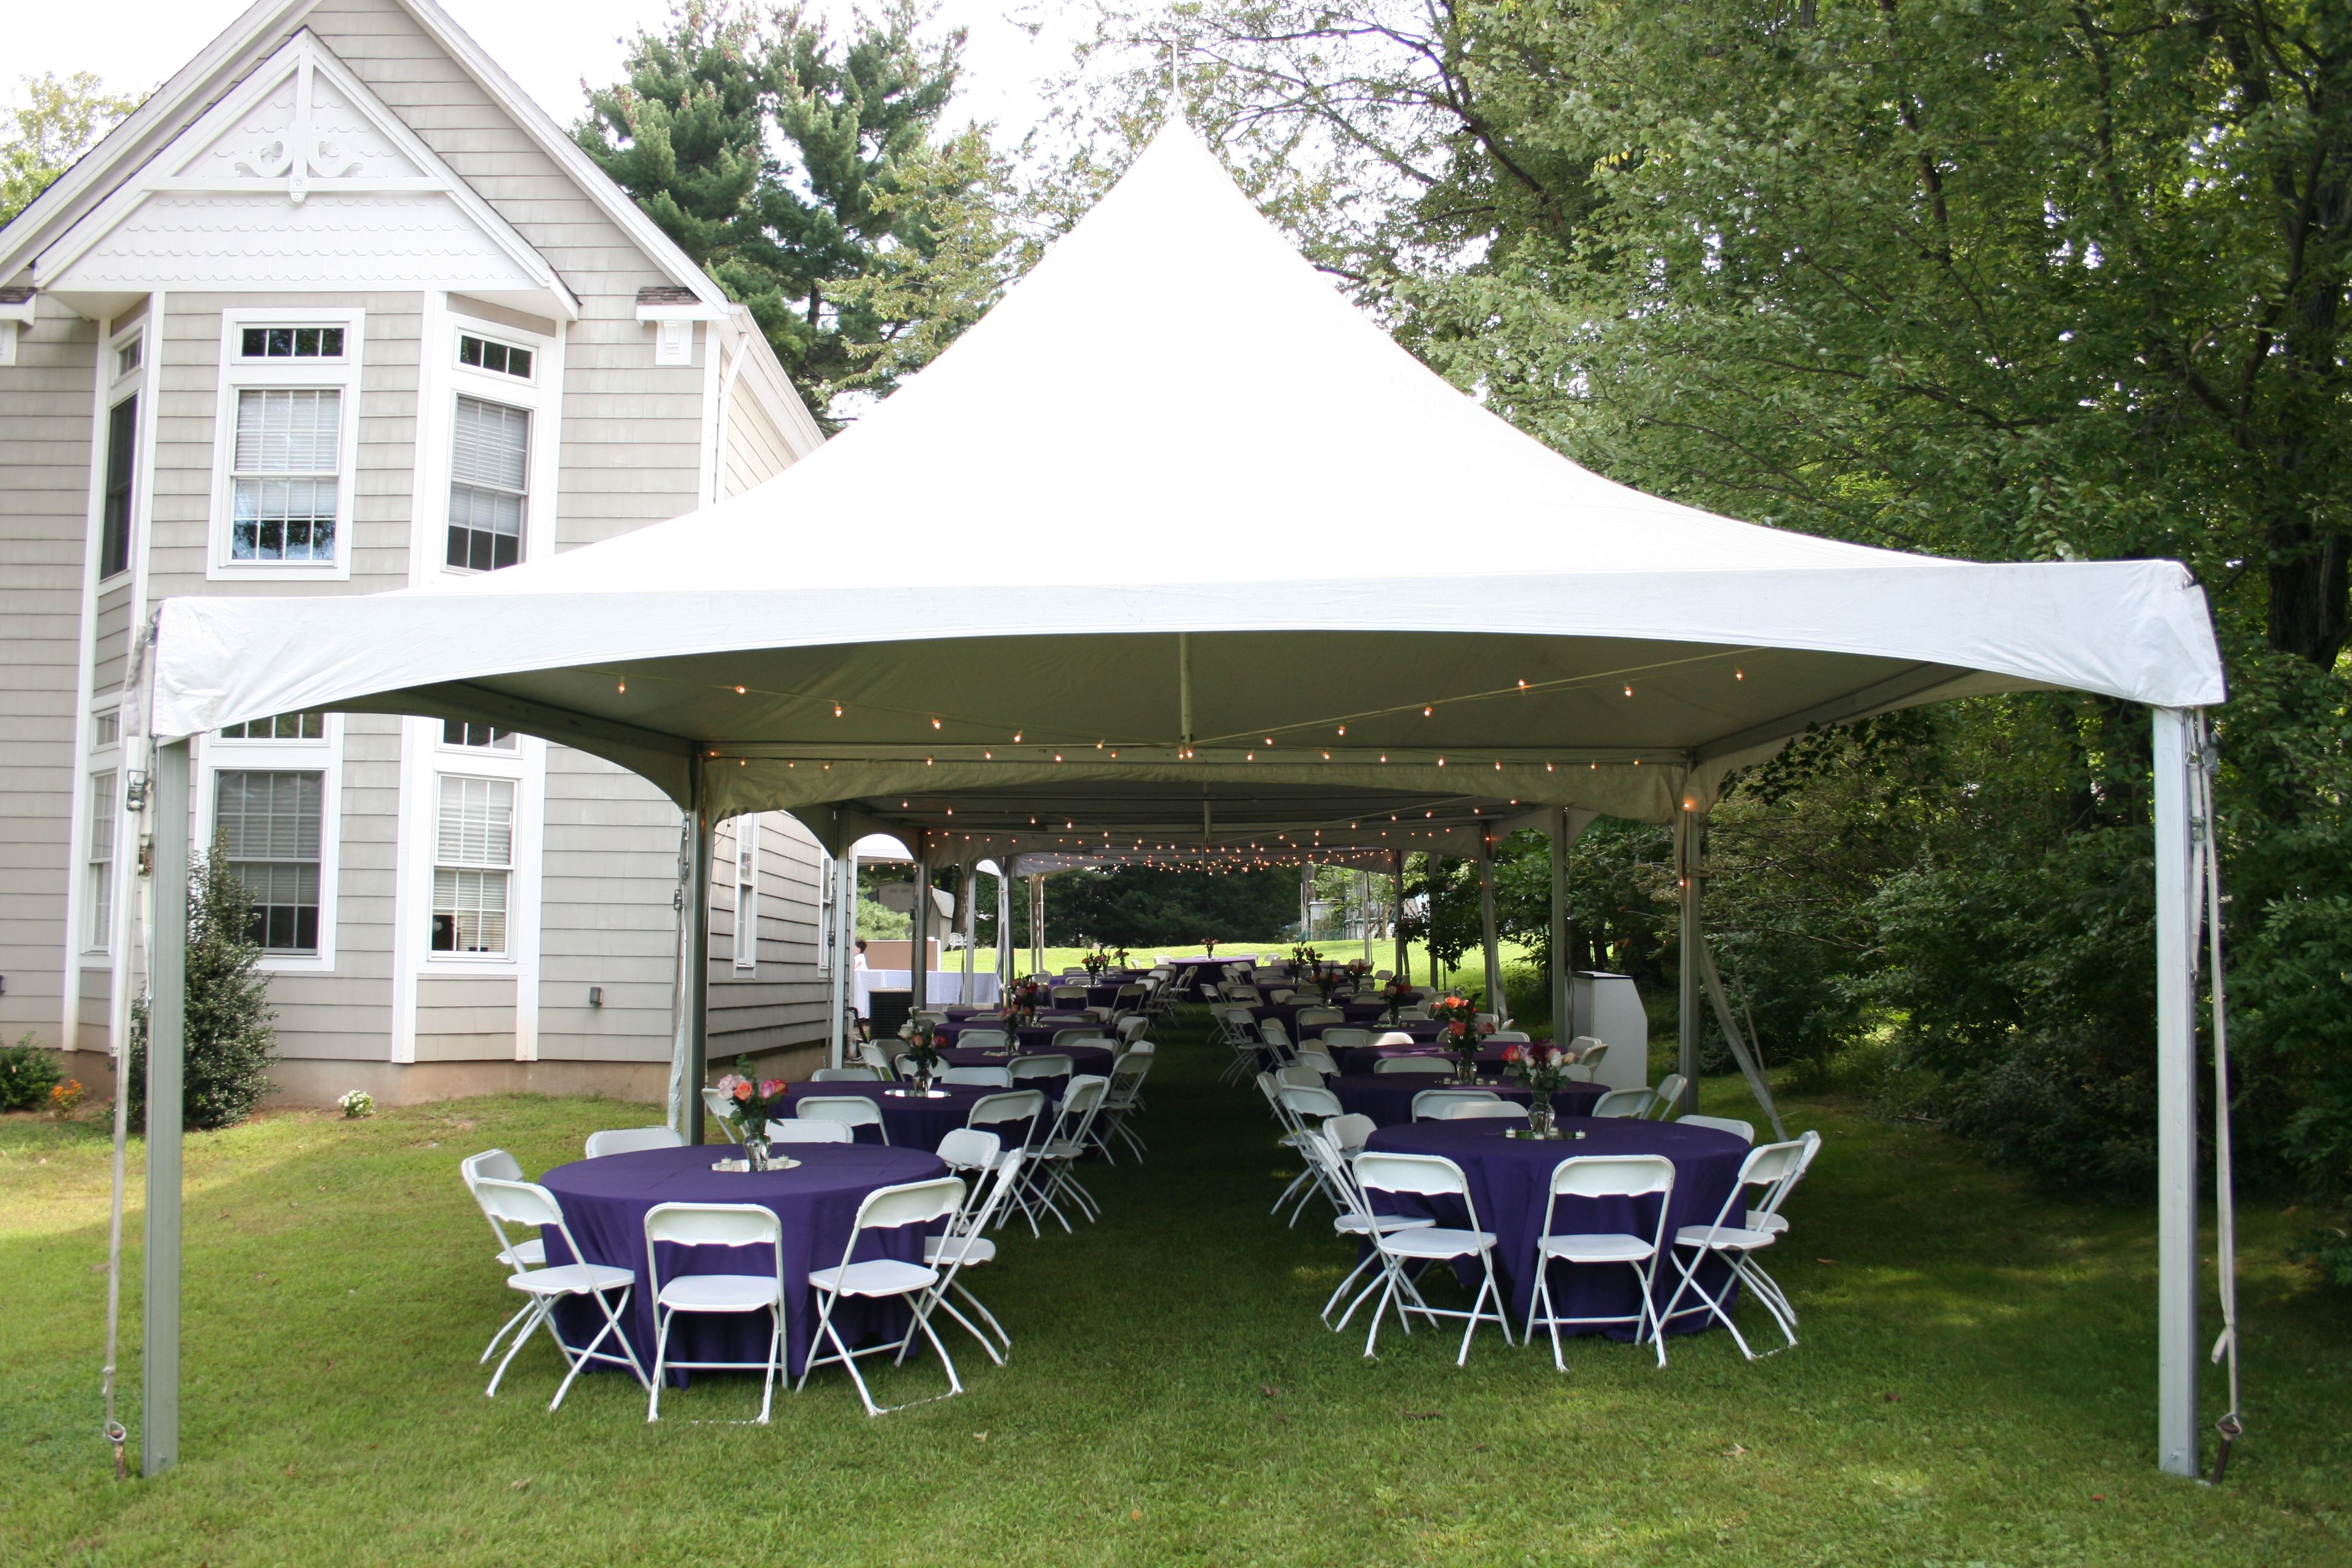 Backyard Rentals For Weddings backyard wedding donesterling party rentals. | weddings